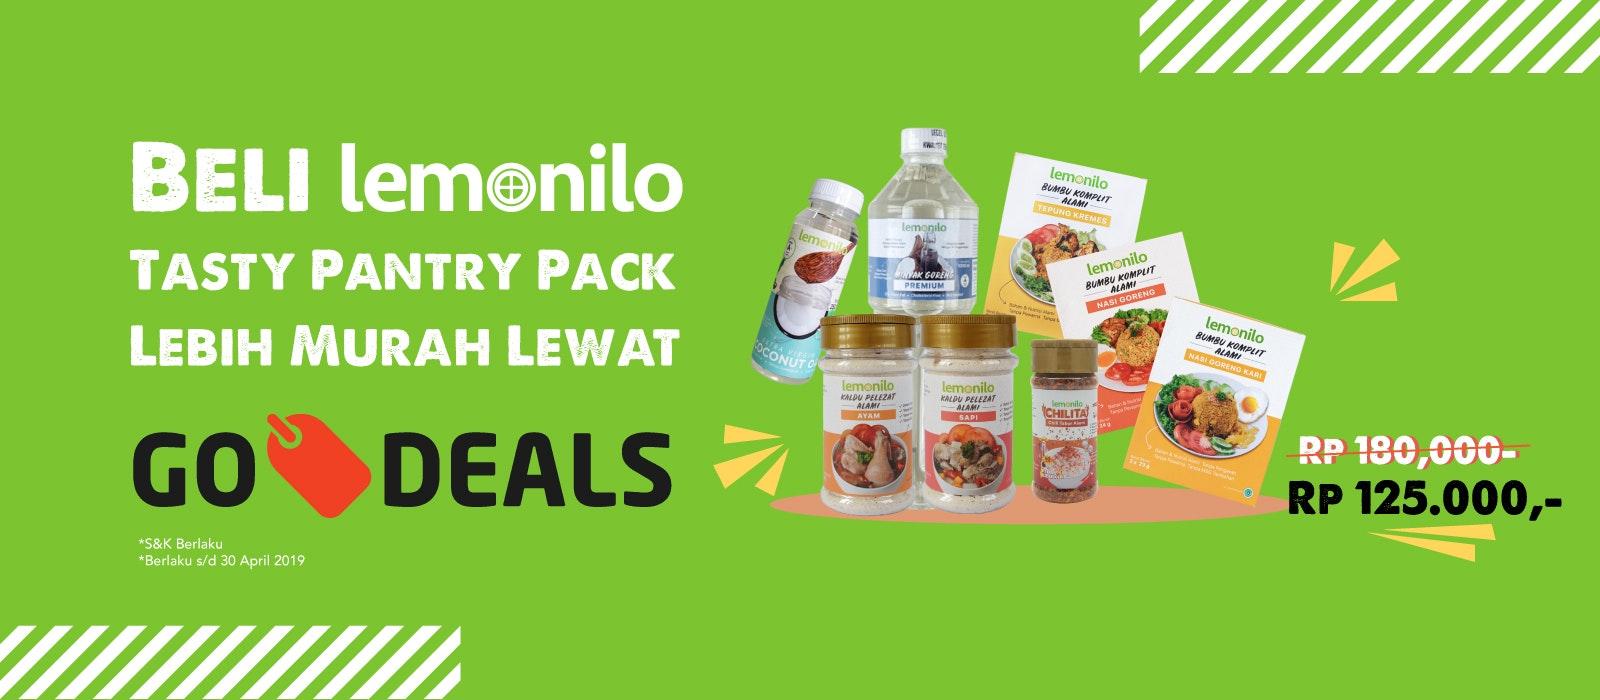 Lemonilo Tasty Pantry Pack Harga Spesial Lewat Go-Deals